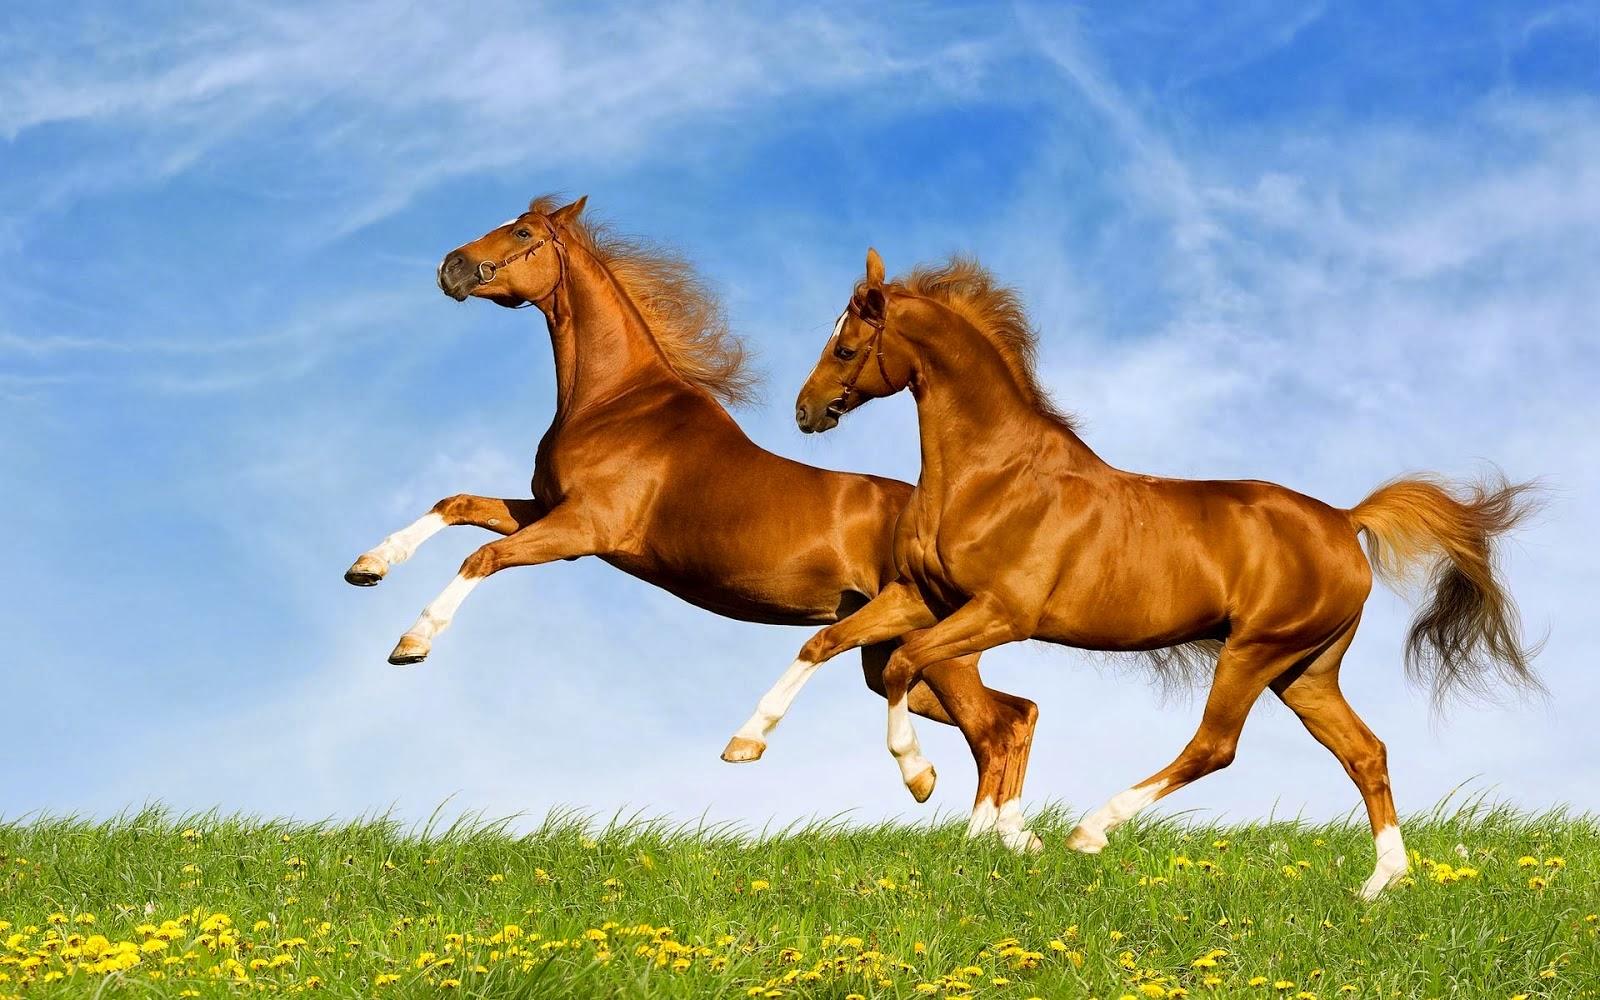 ��� ���� ����� ������ ���� , ���� ���� ���� ���� , ����� ���� ������ 2016 , Photos horses 2015_1412121753_467.